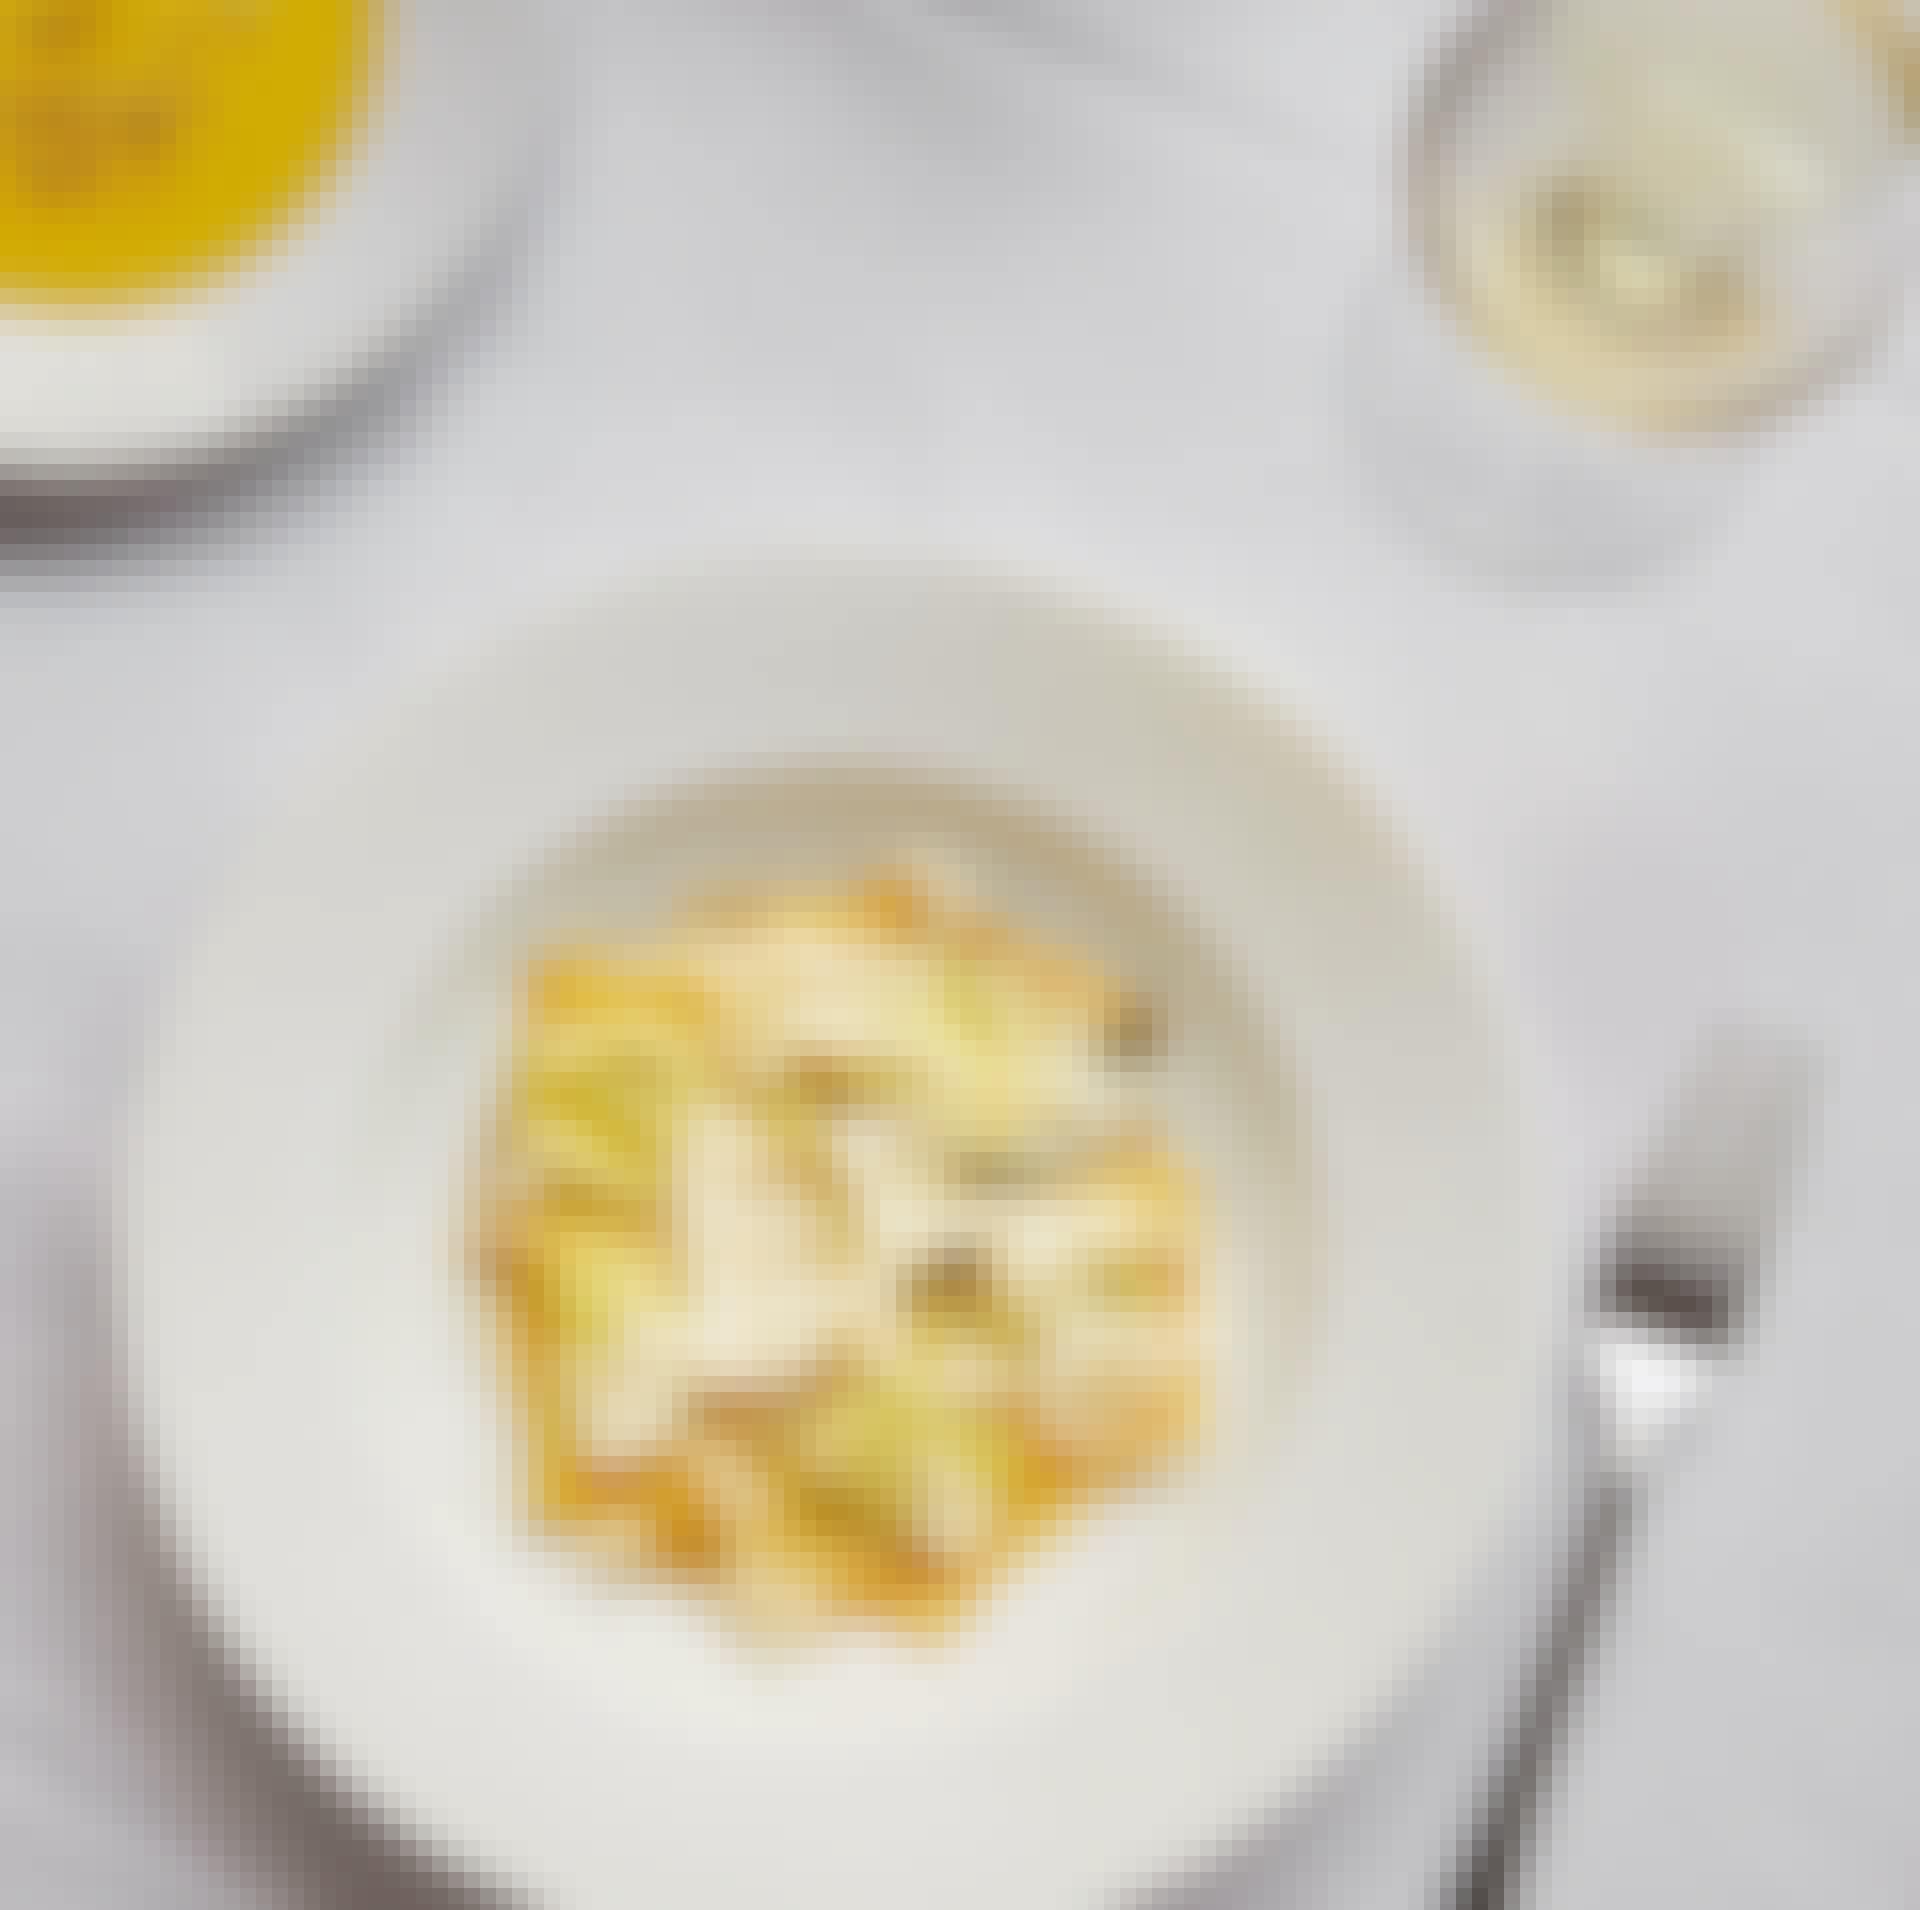 pasta italiensk mangia vesterbro